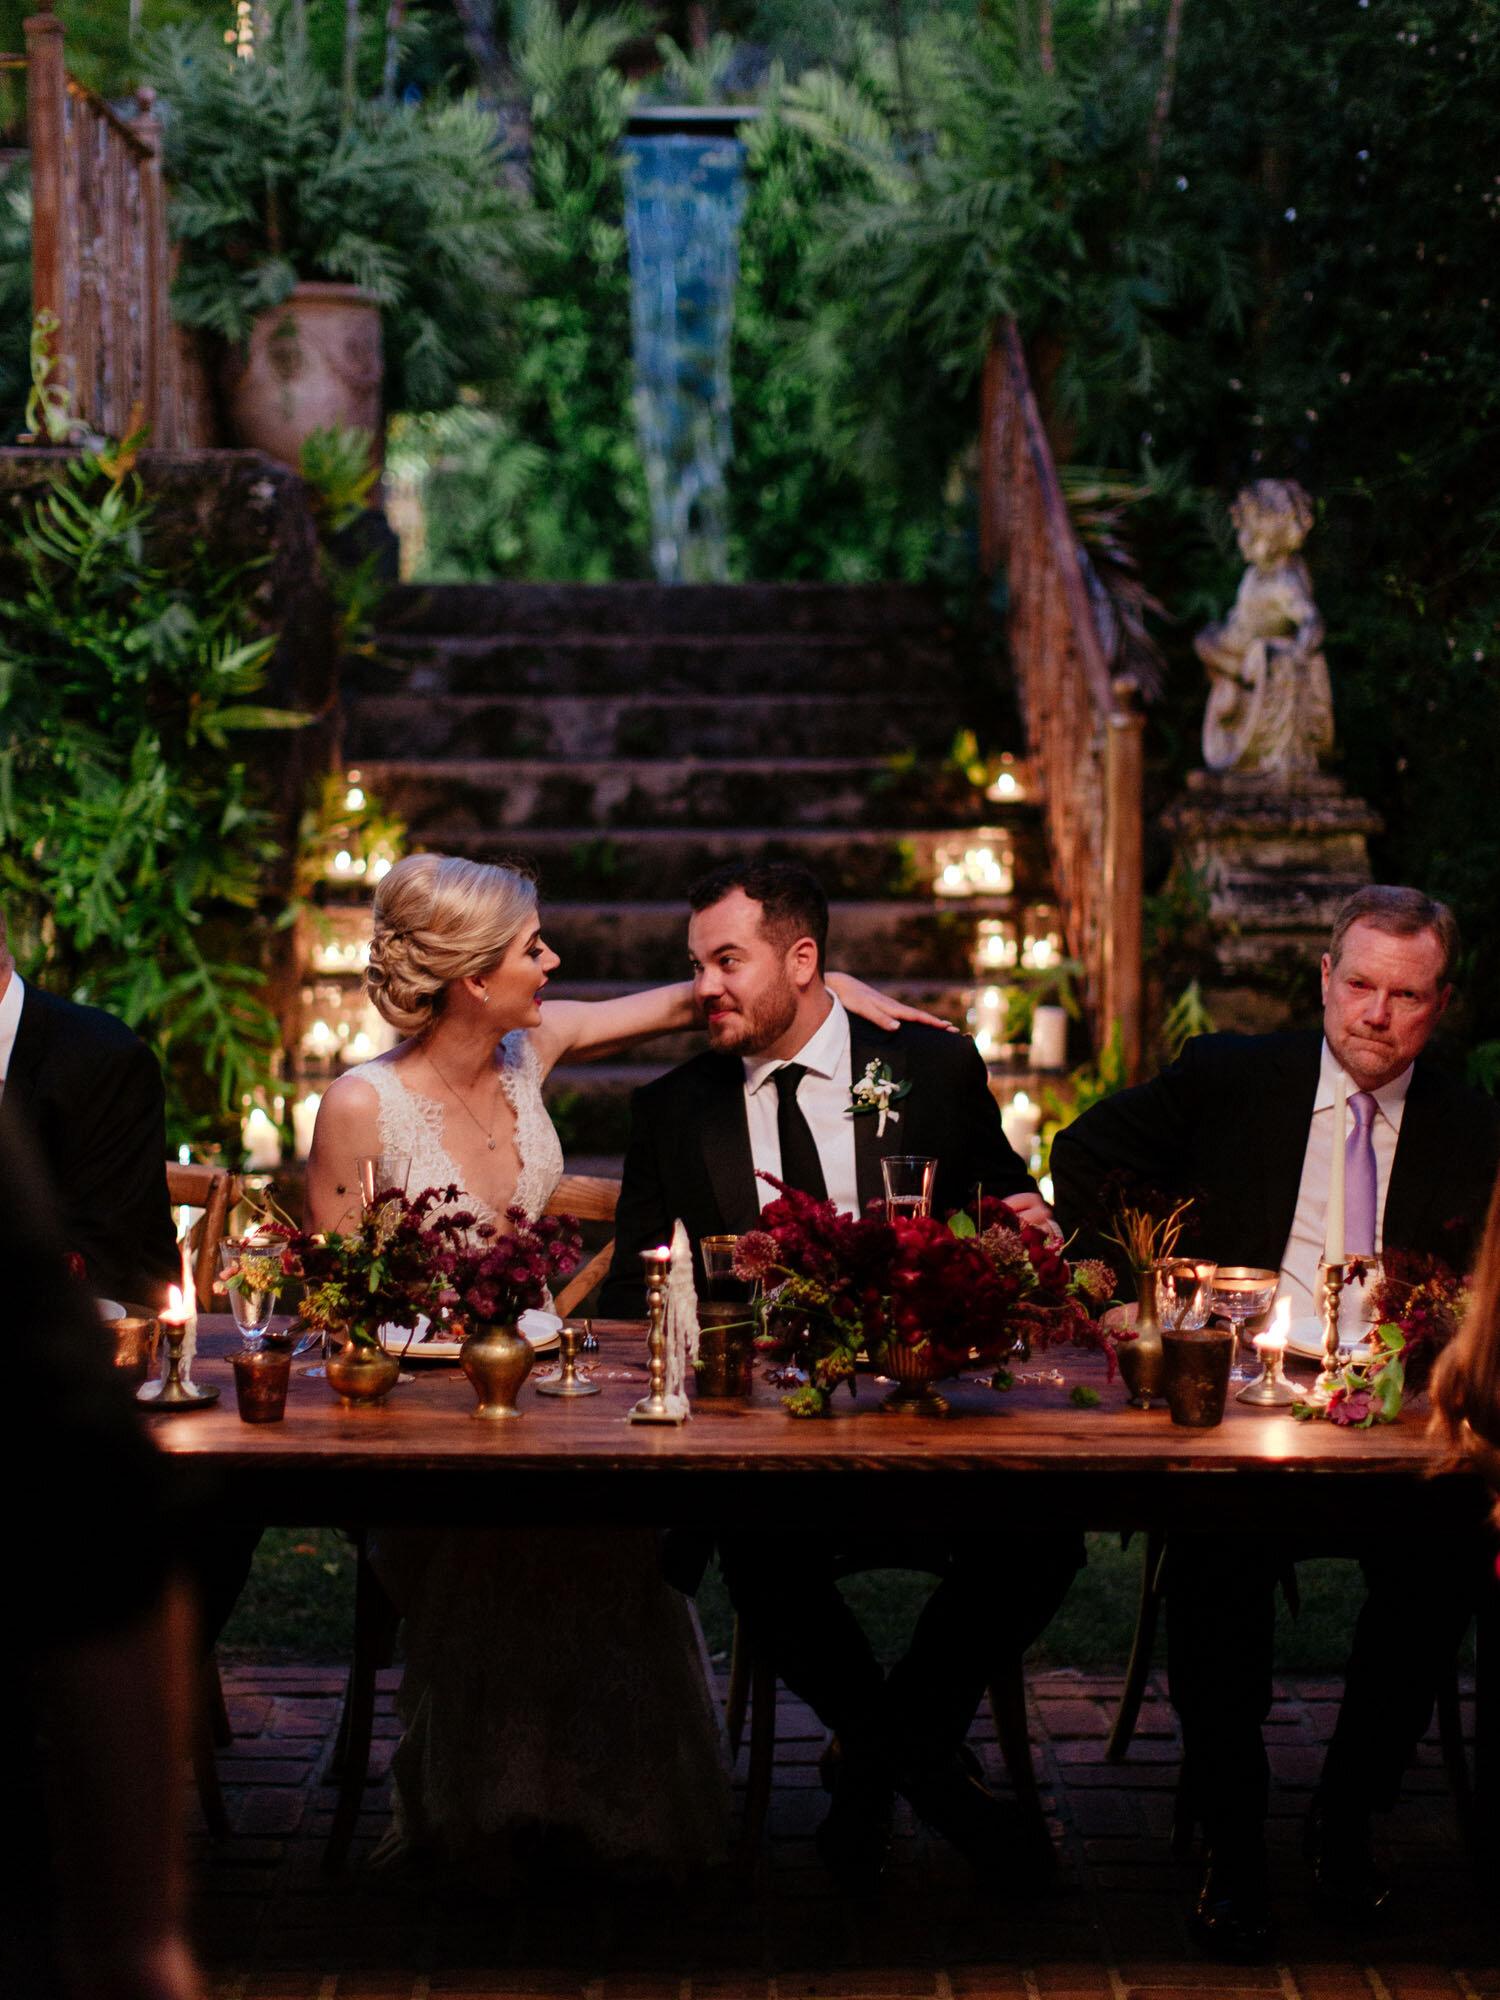 Chris-J-Evans-Maui-Wedding-Kim&Brian4587.jpg